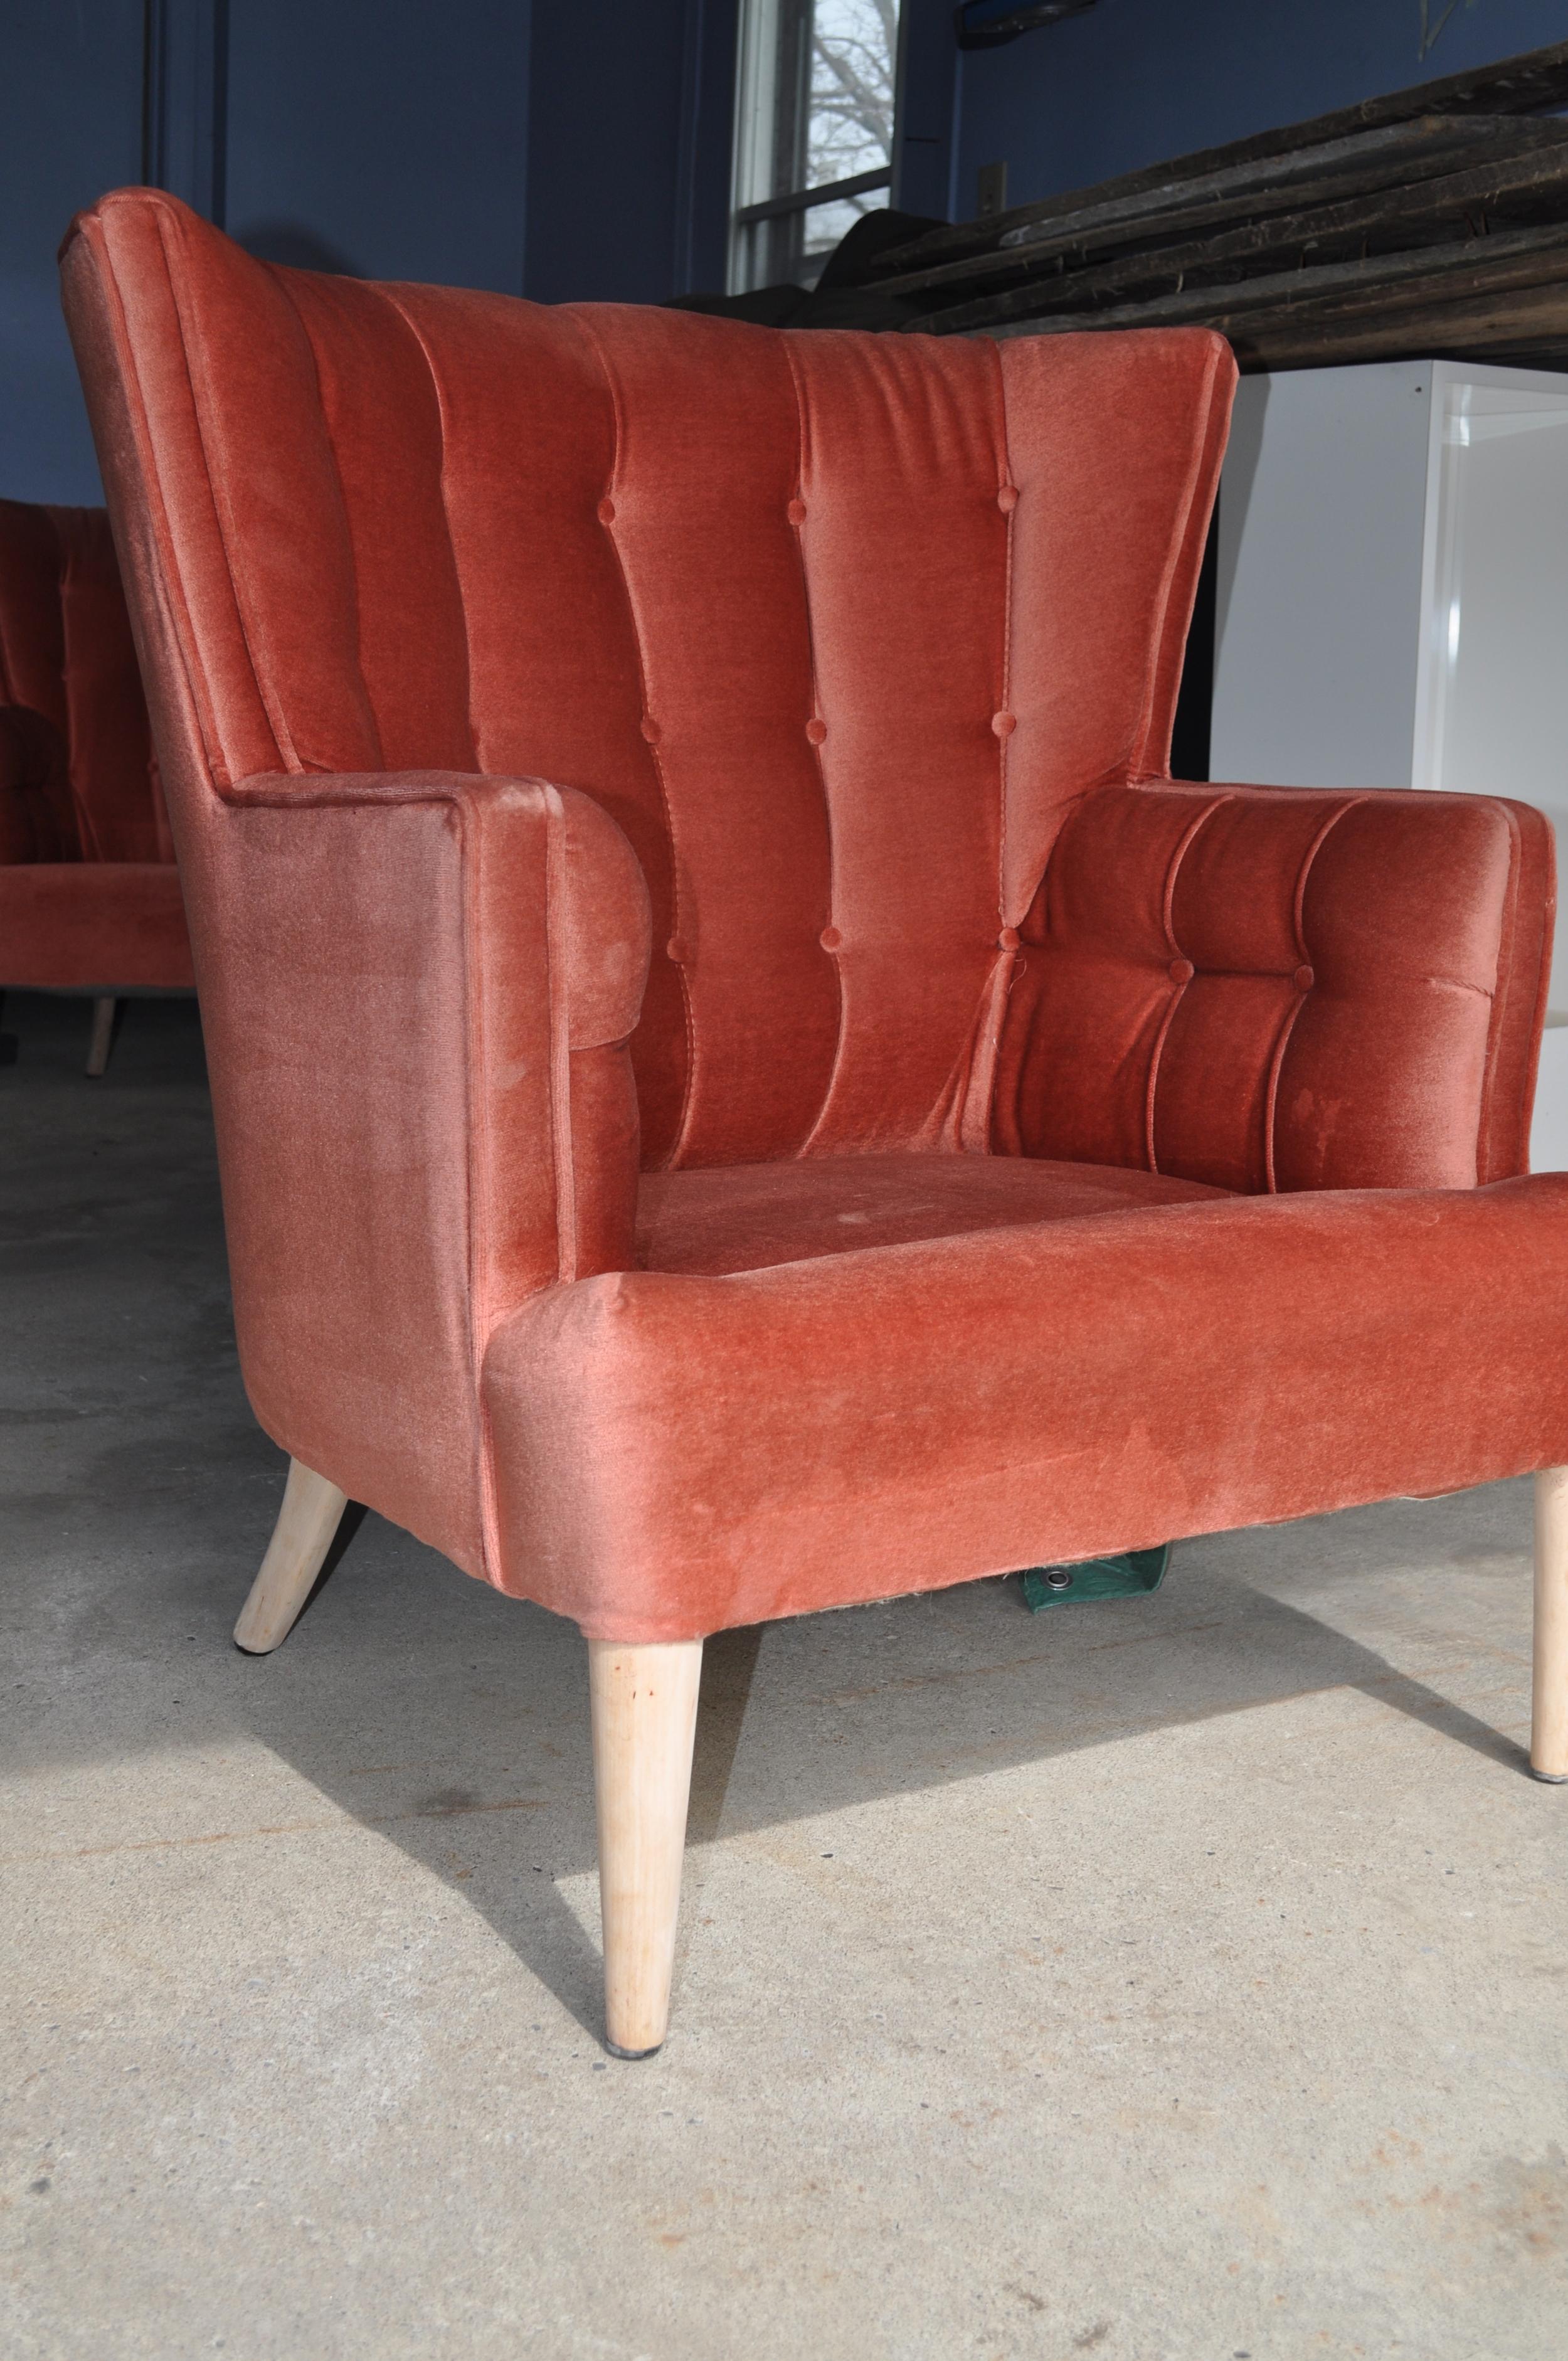 Chair Legs Sanding complete 2